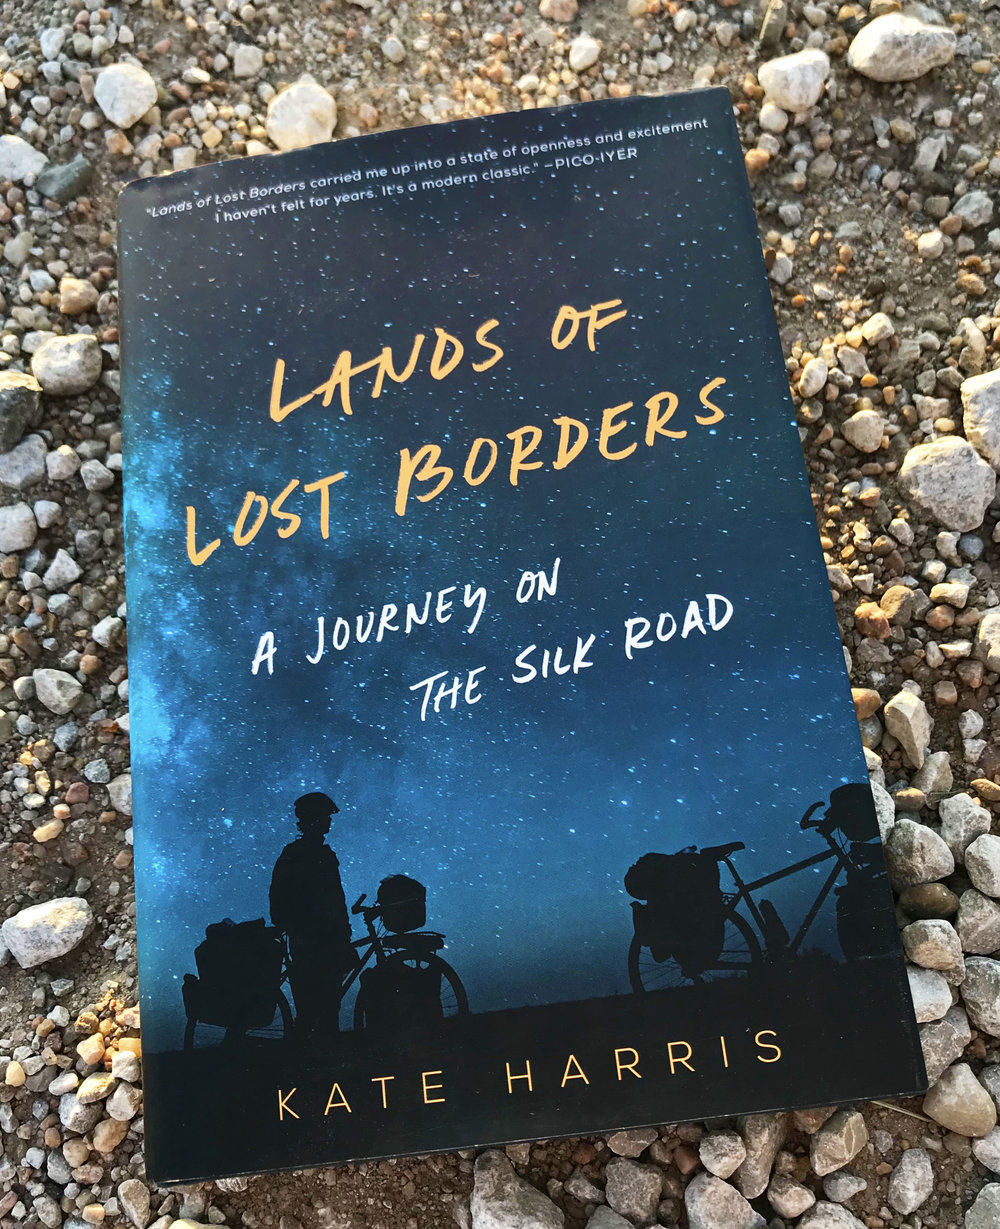 Lands of Lost Boarders by Kate Harris